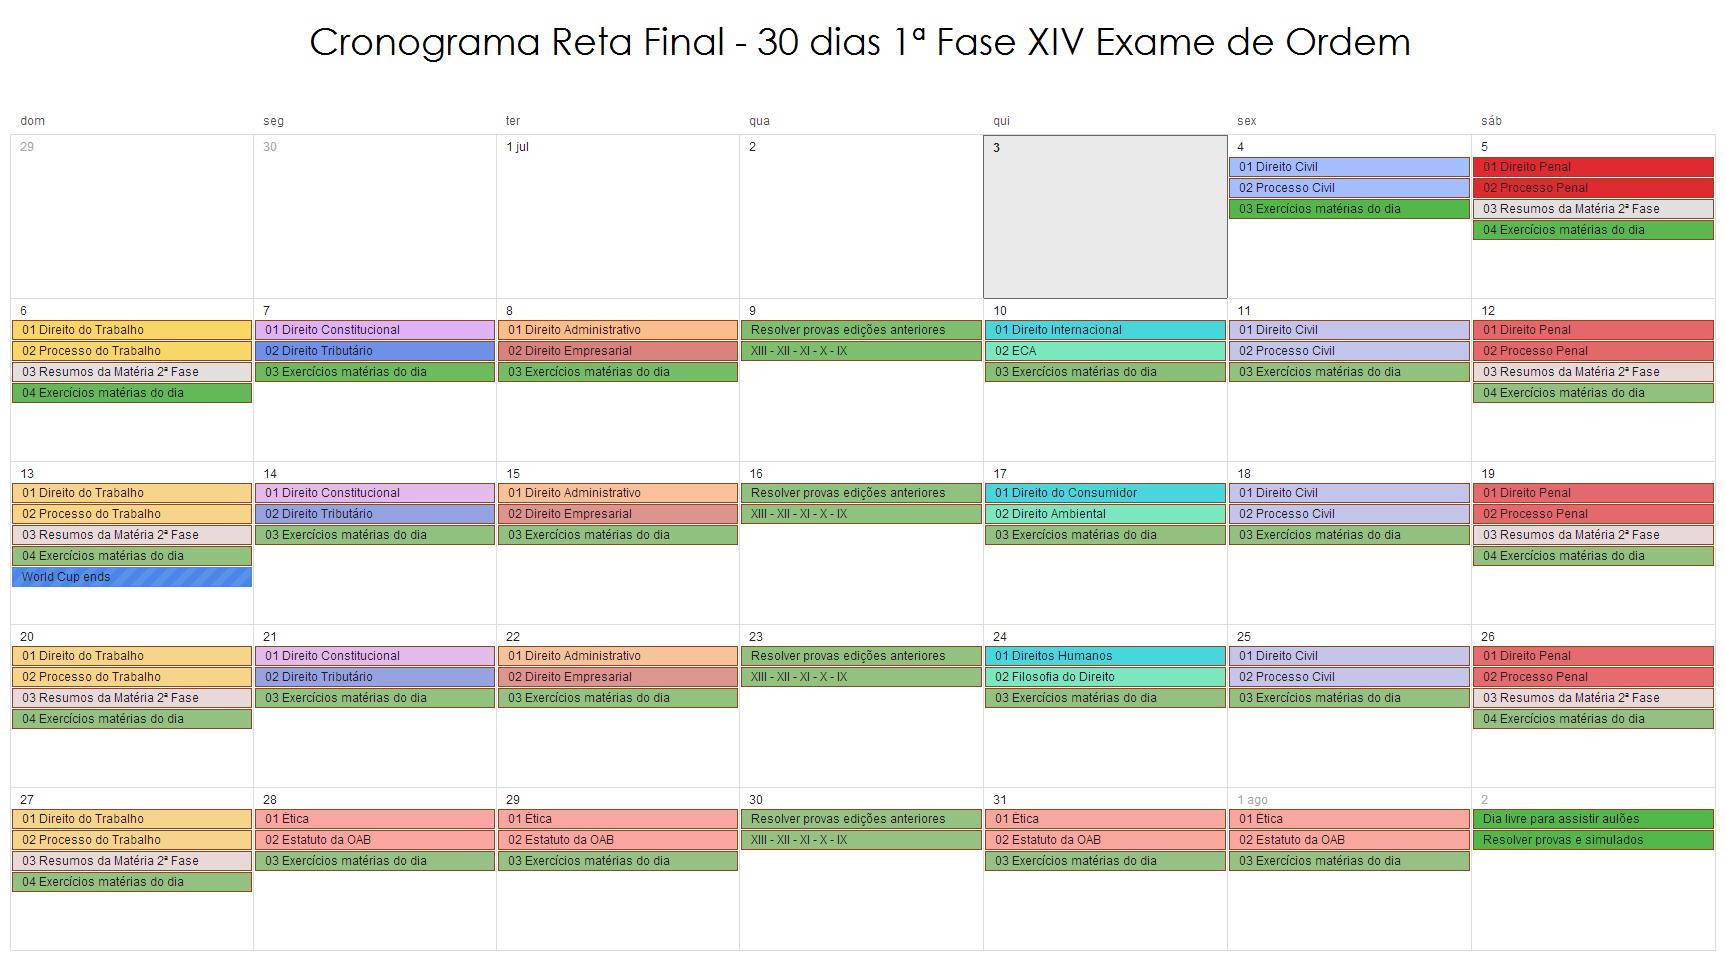 Cronograma Reta Fibal 1ª Fase XIV Exame de Ordem - OAB